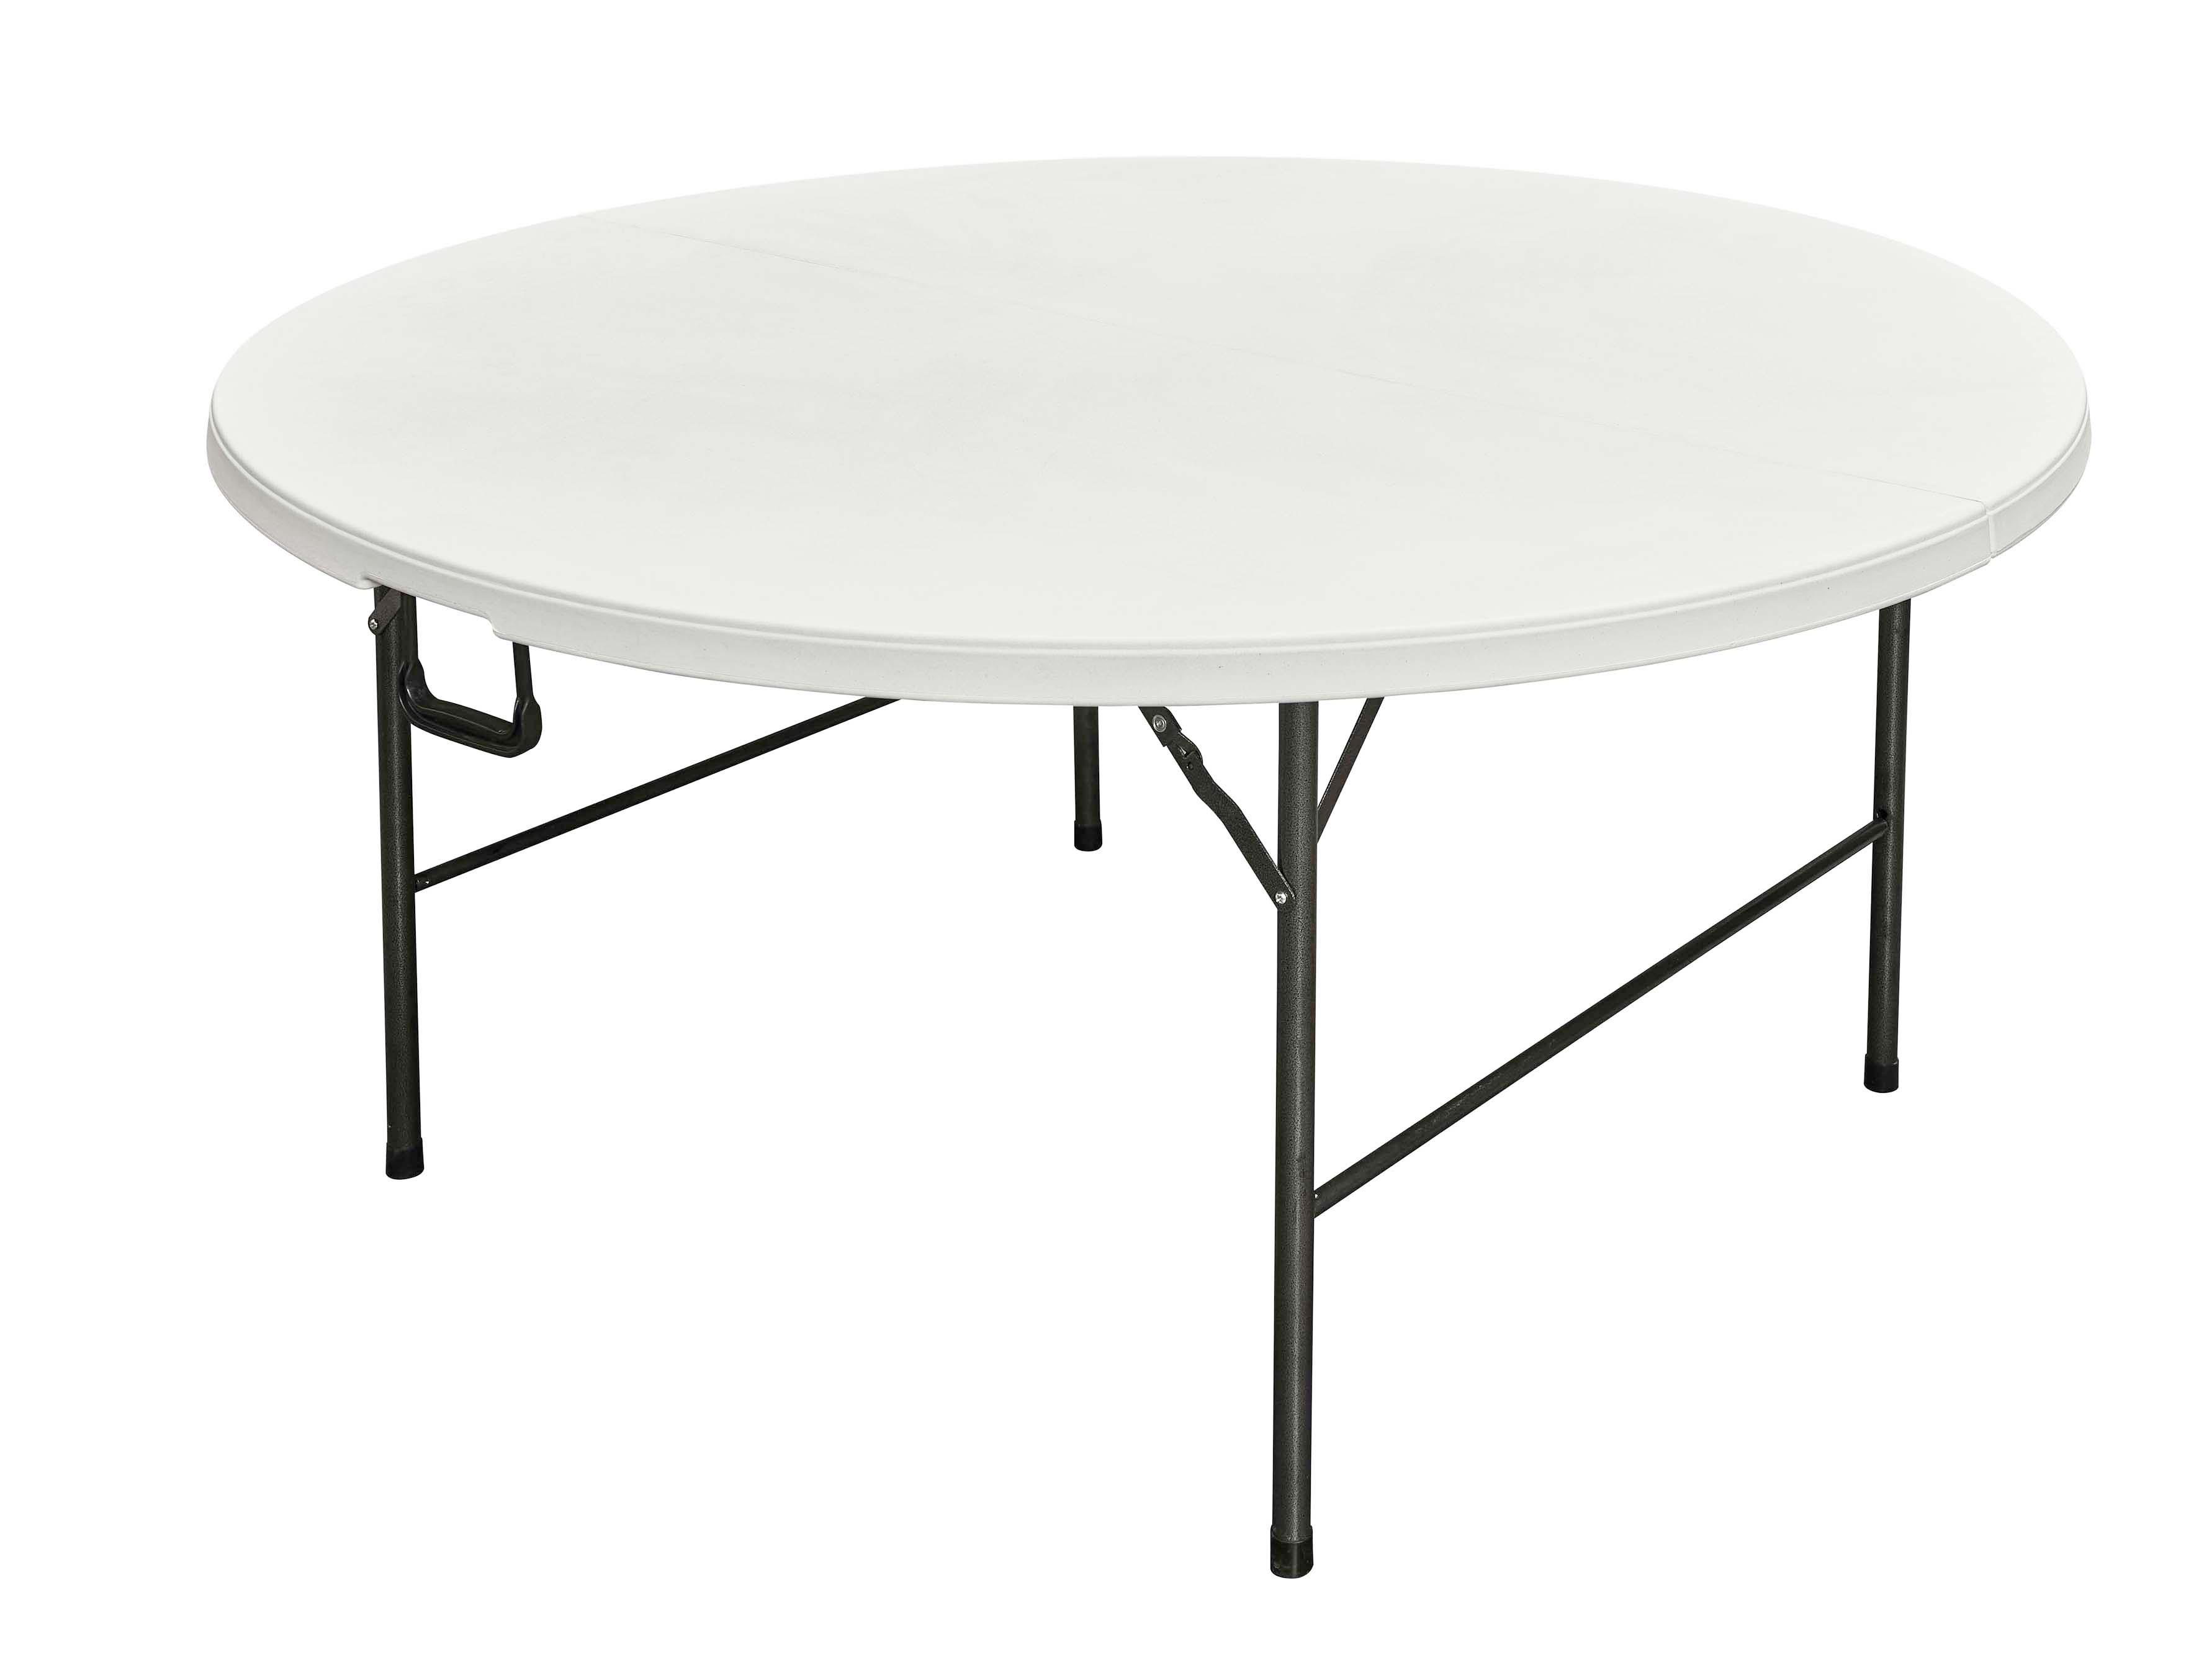 table reception pliante lot de tables pliantes de. Black Bedroom Furniture Sets. Home Design Ideas